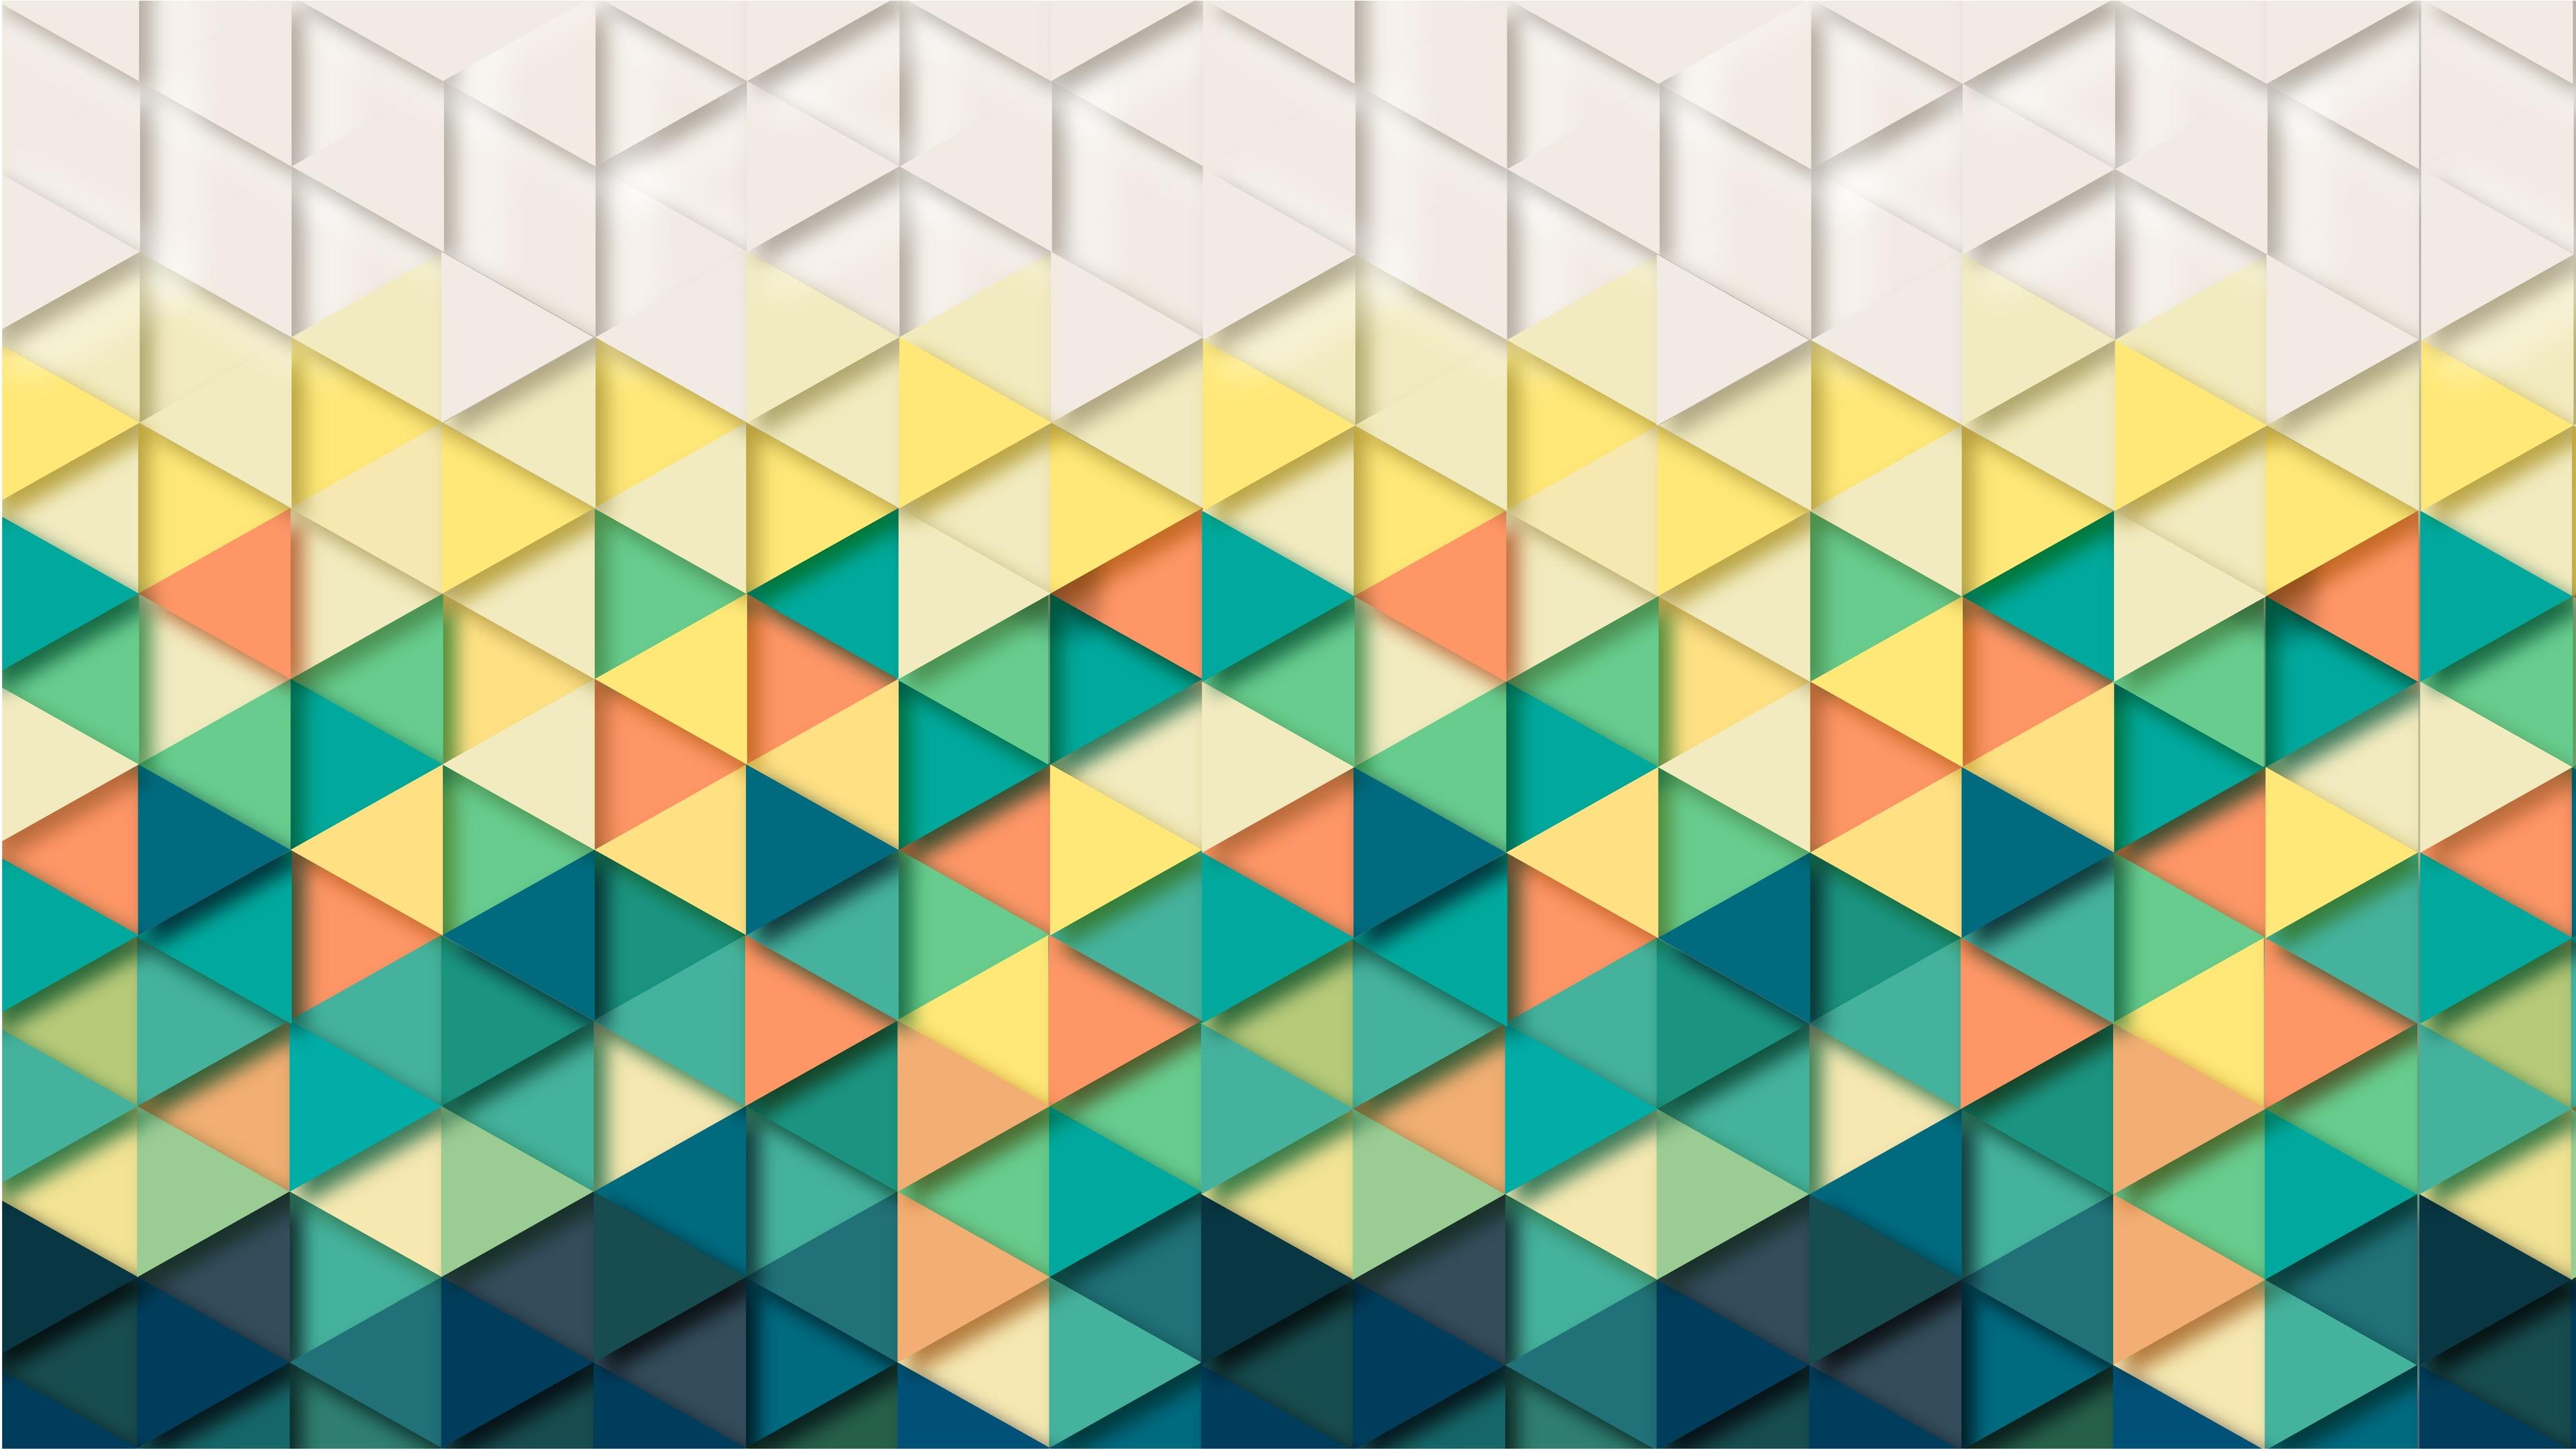 triangle pattern 8k 1539371067 - Triangle Pattern 8k - triangle wallpapers, pattern wallpapers, hd-wallpapers, abstract wallpapers, 8k wallpapers, 5k wallpapers, 4k-wallpapers